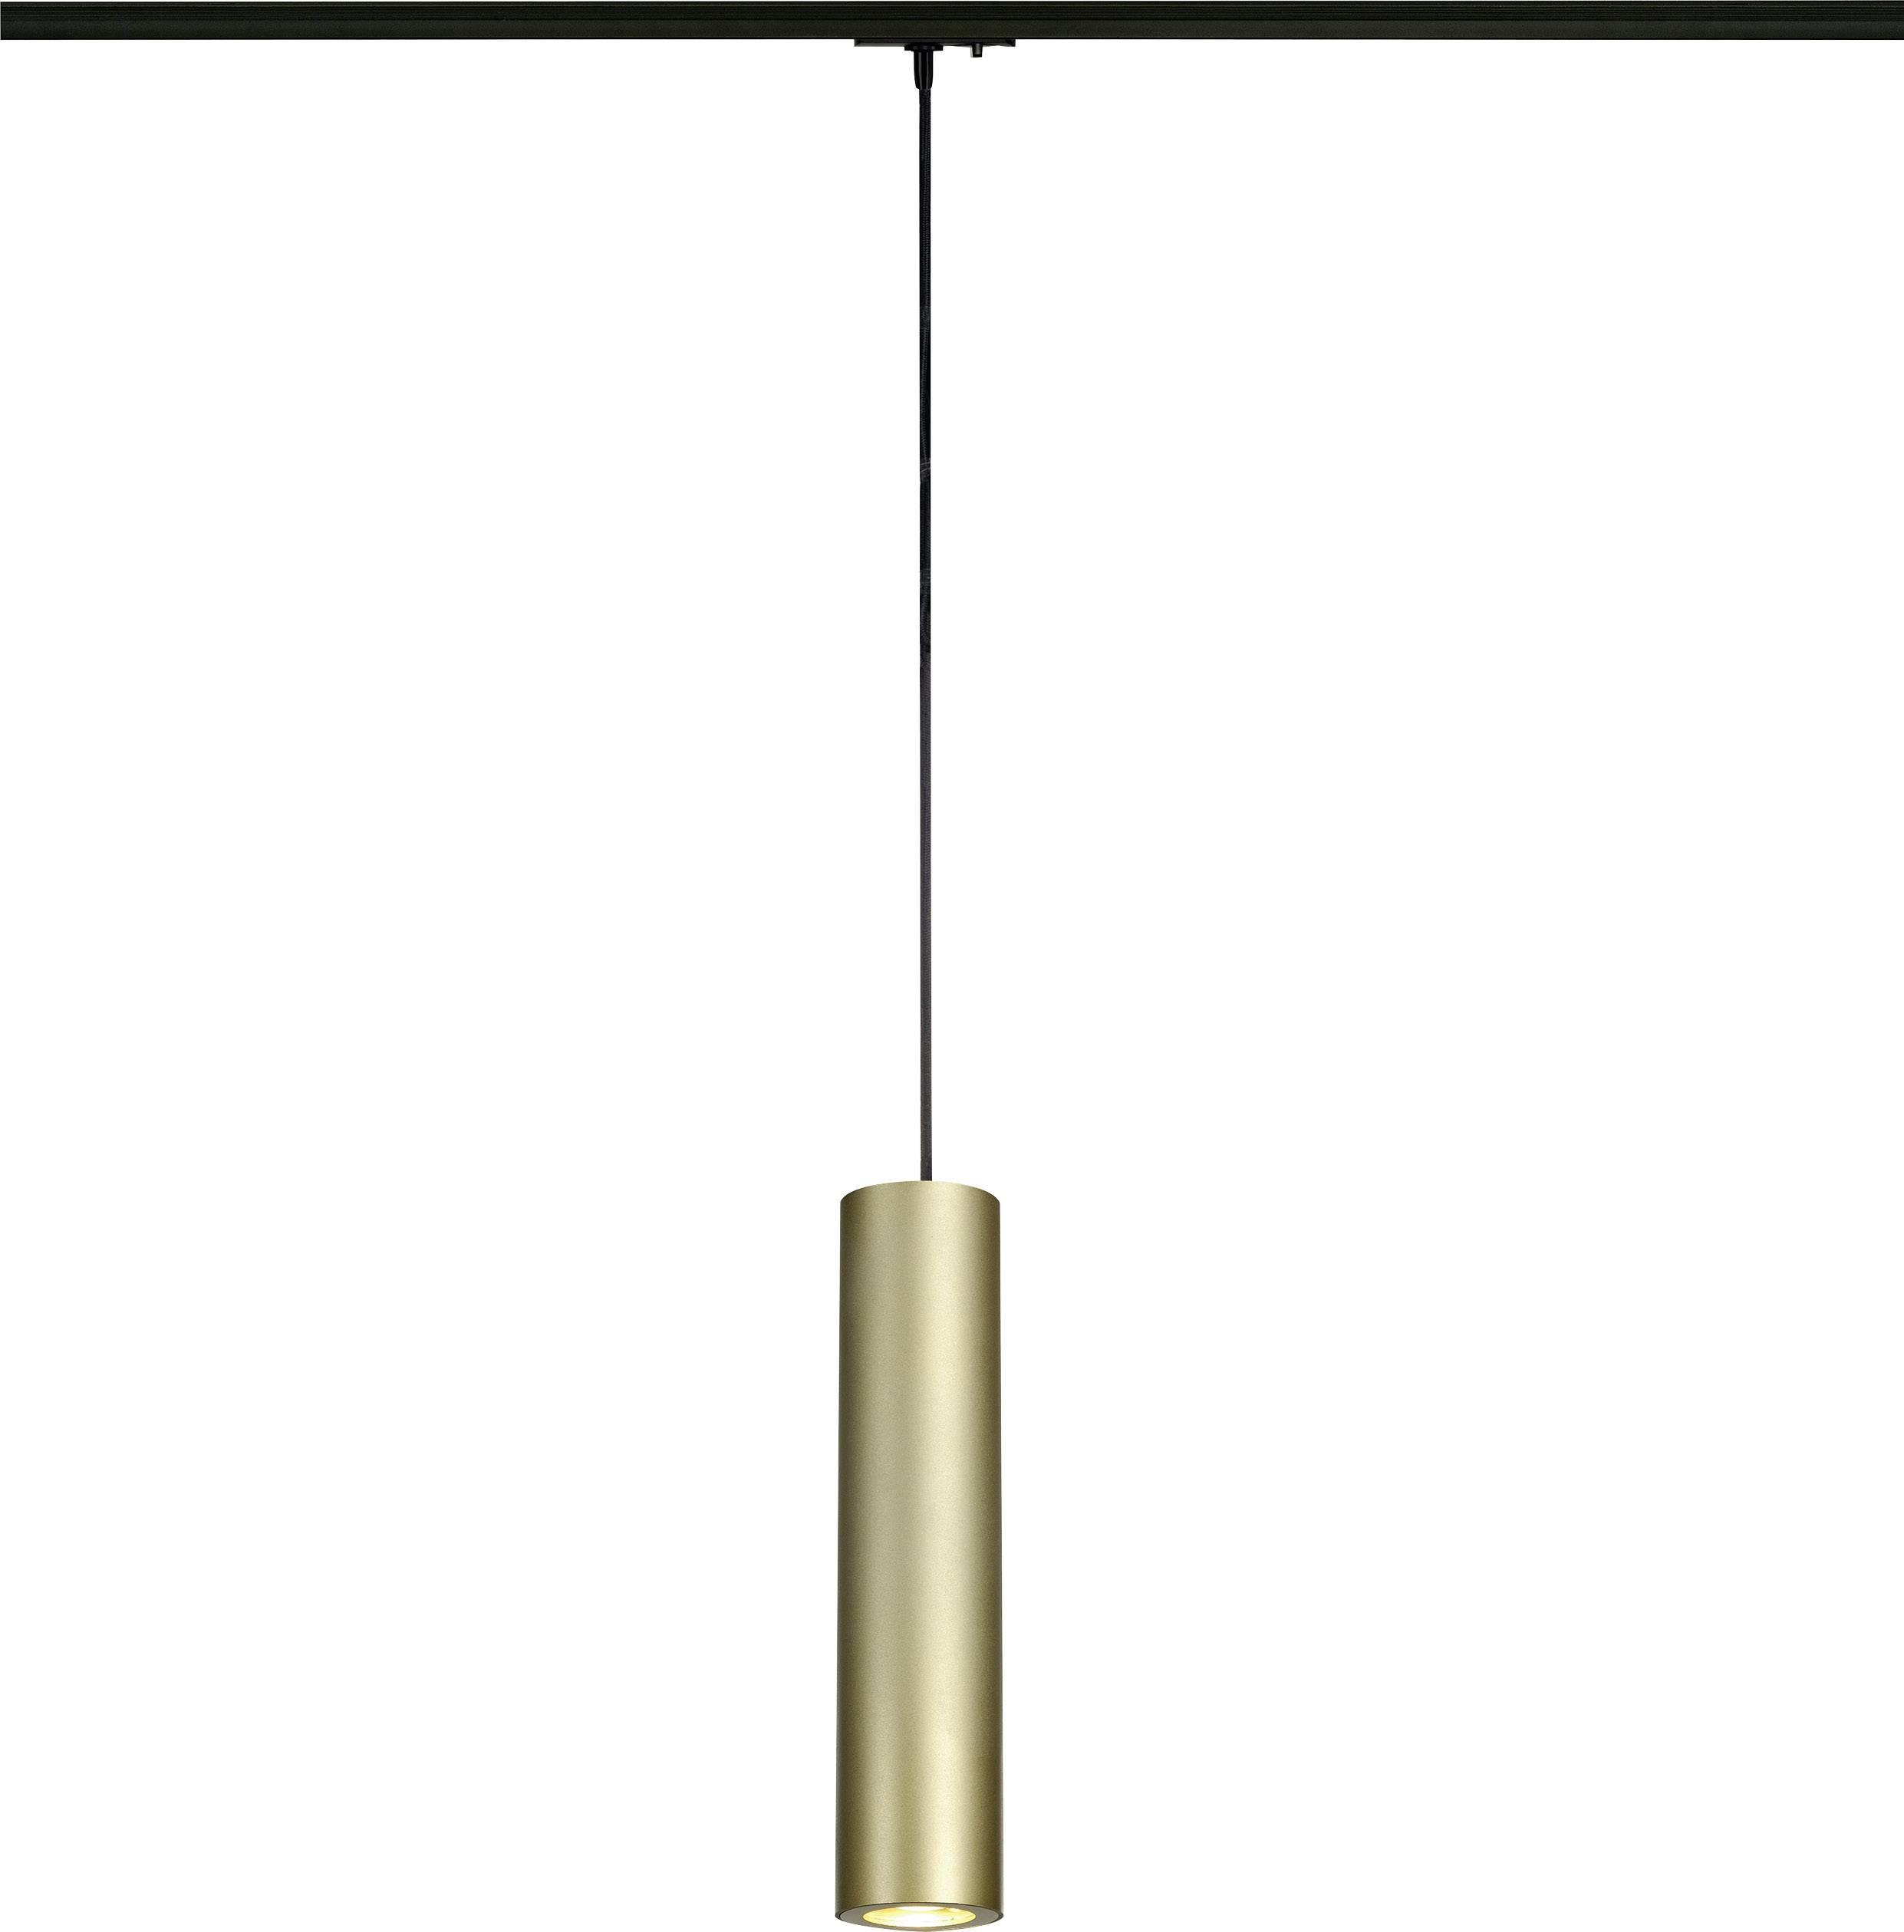 Svítidla do lištových systémů (230 V) - SLV Enola, GU10, 1fázové, 50 W, mosaz, černá